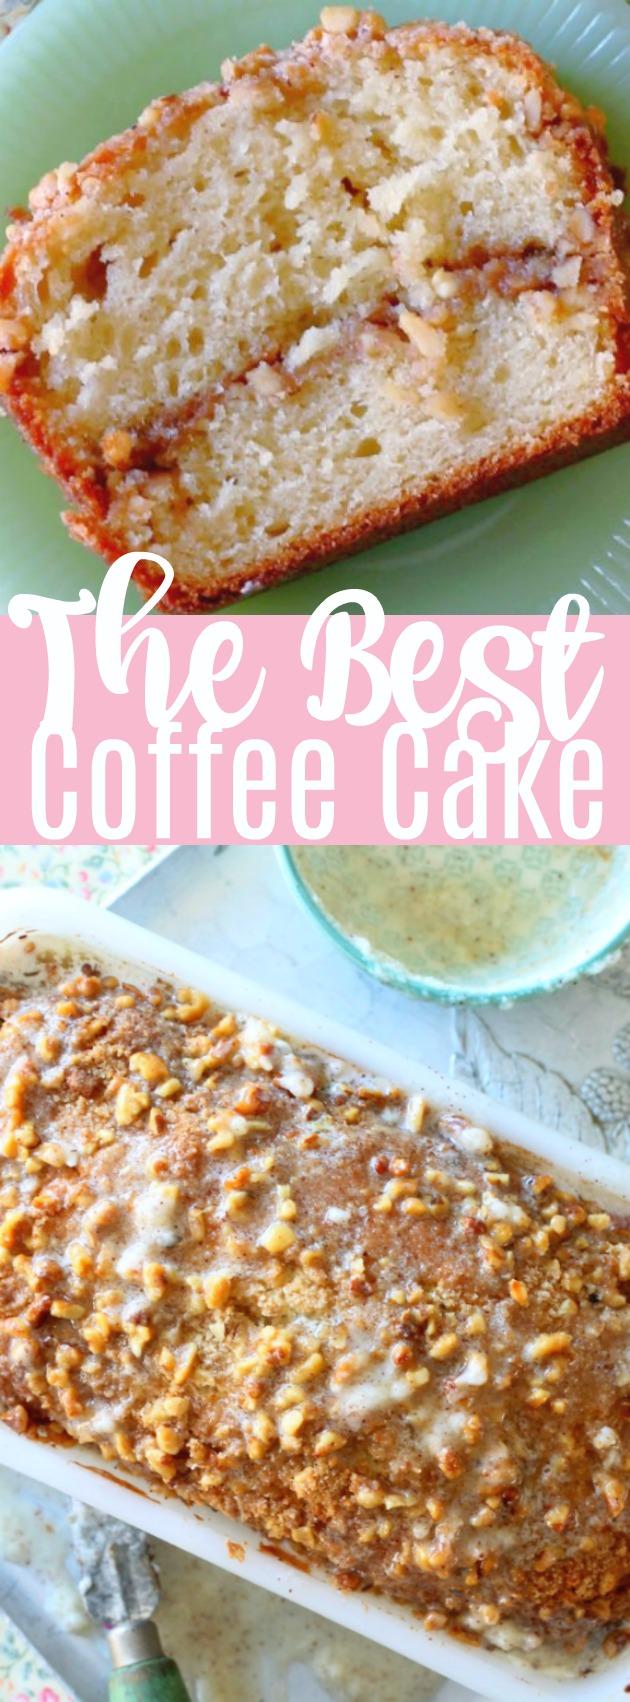 The Best Coffee Cake | Foodtastic Mom #coffeecake #cakerecipes #sourcreamcoffeecake via @foodtasticmom